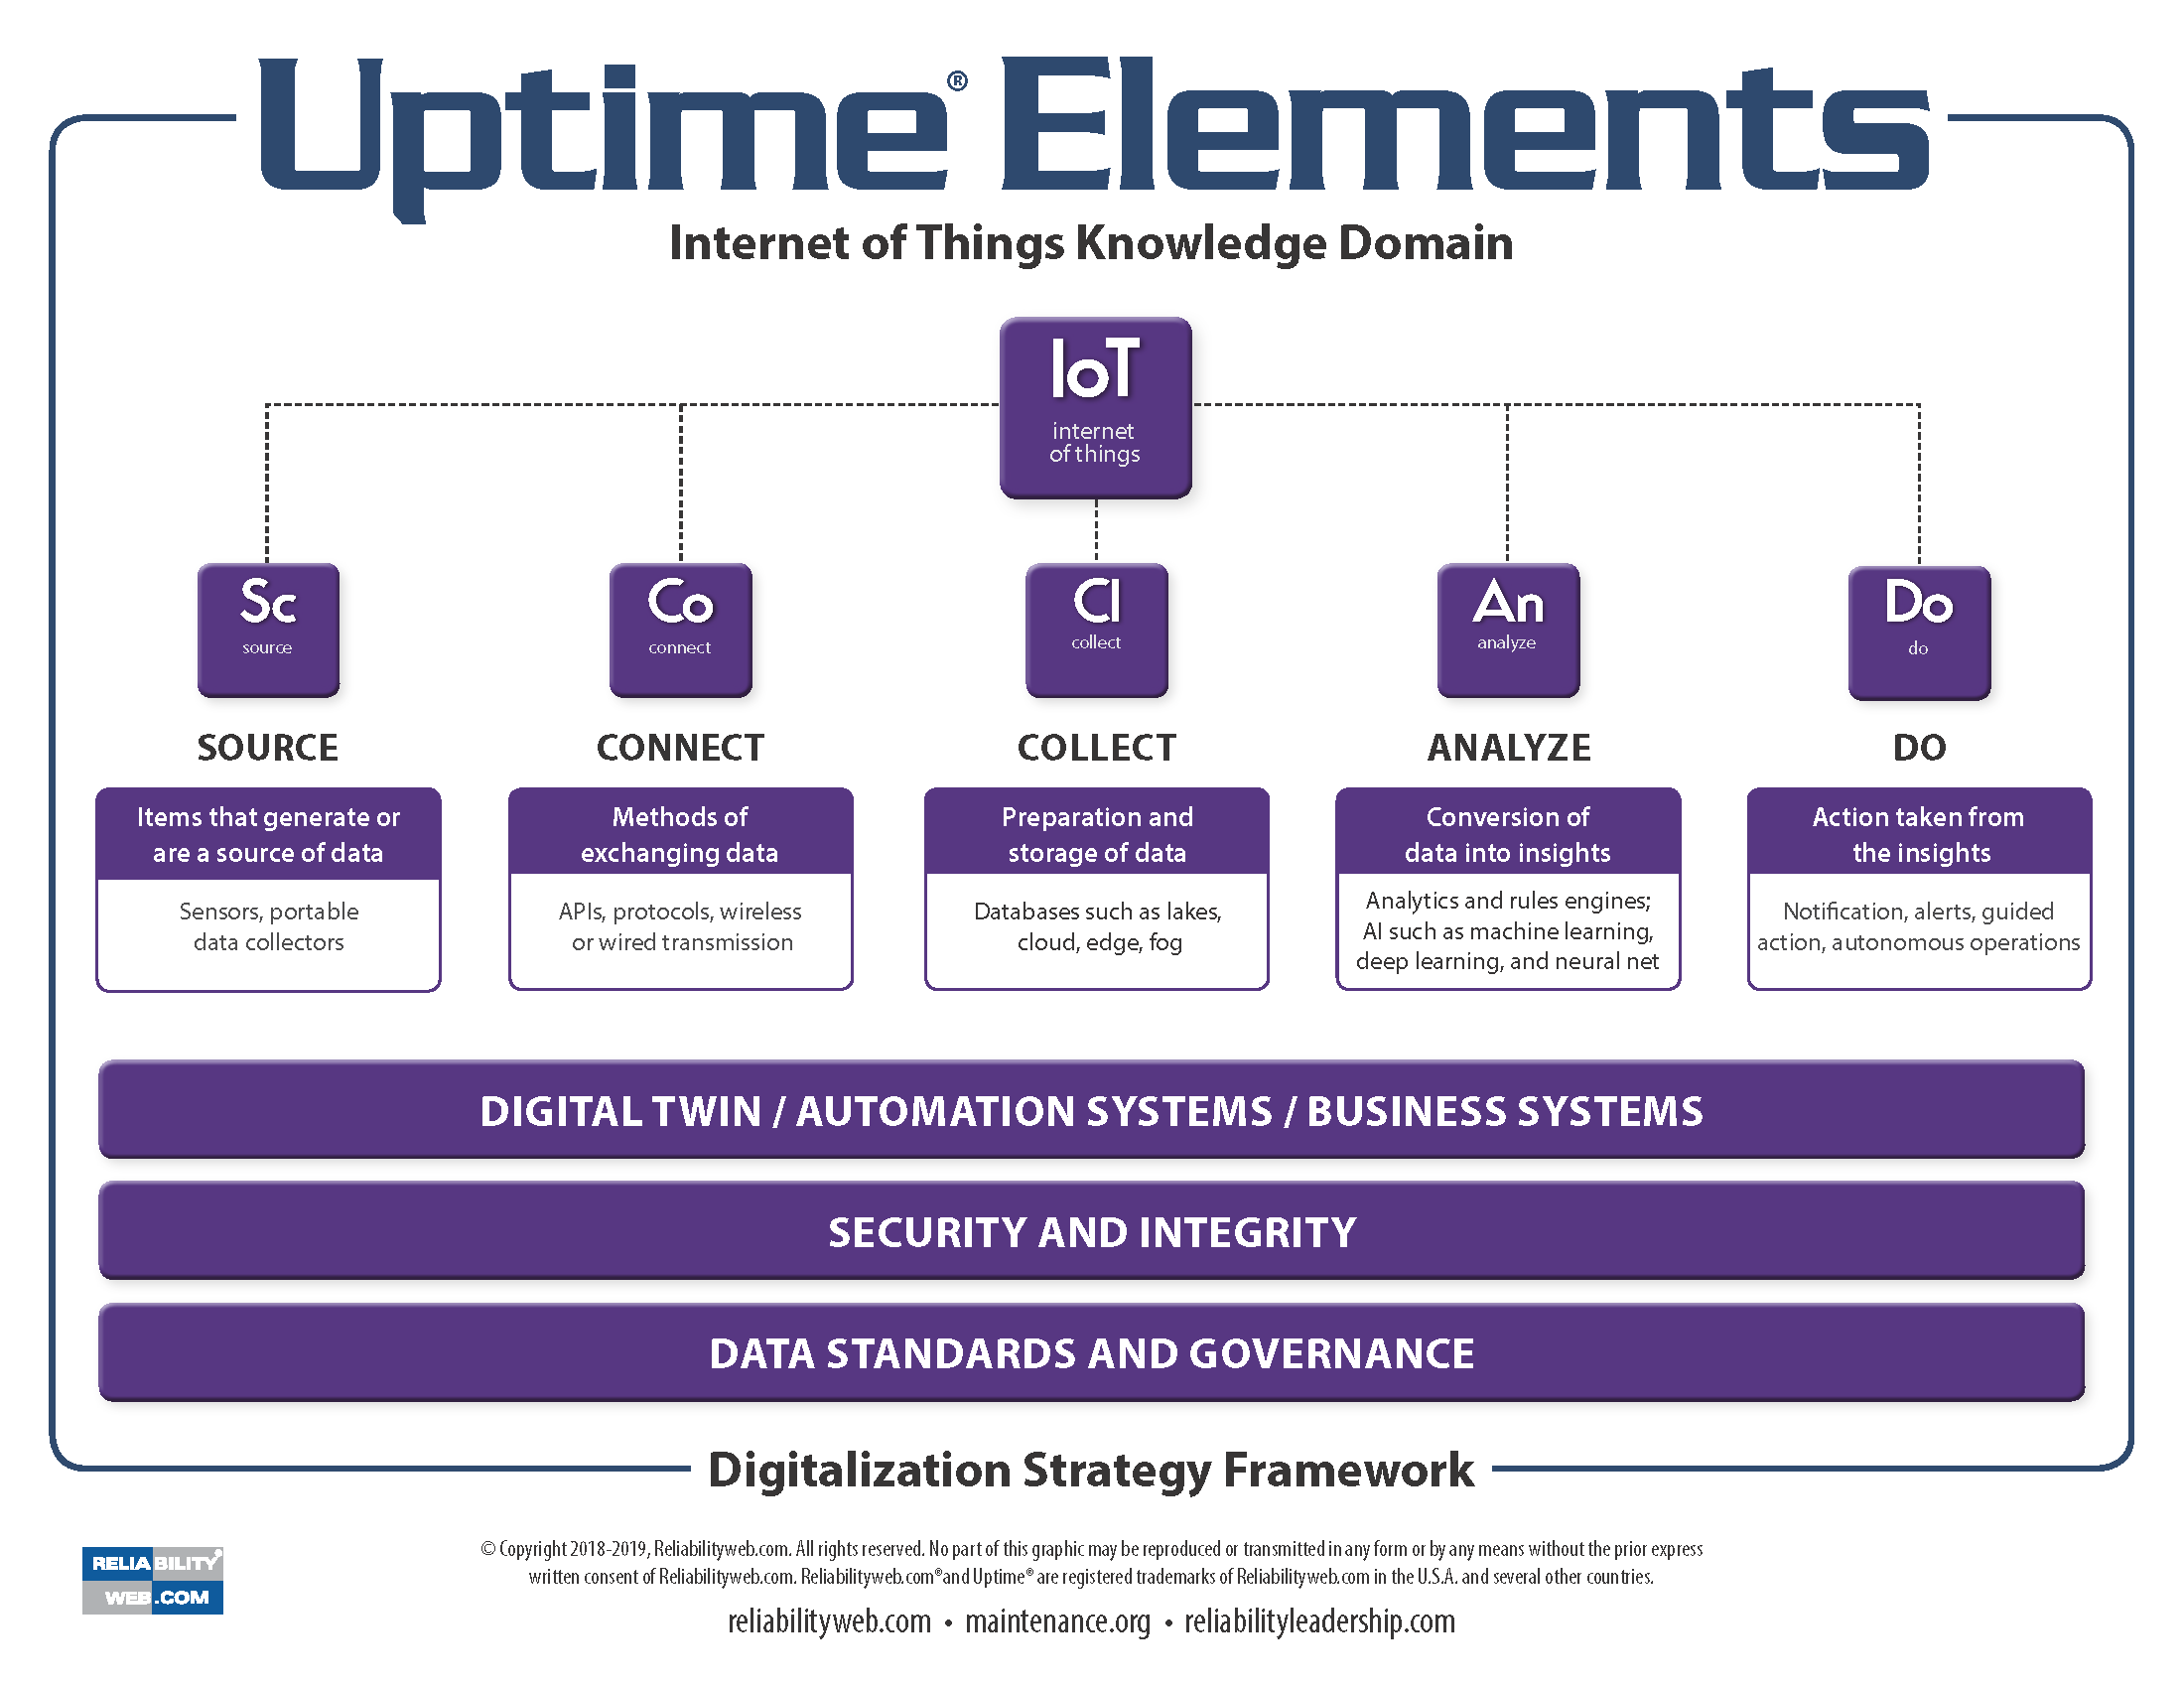 Uptime Elements Digitalization Strategy Framework